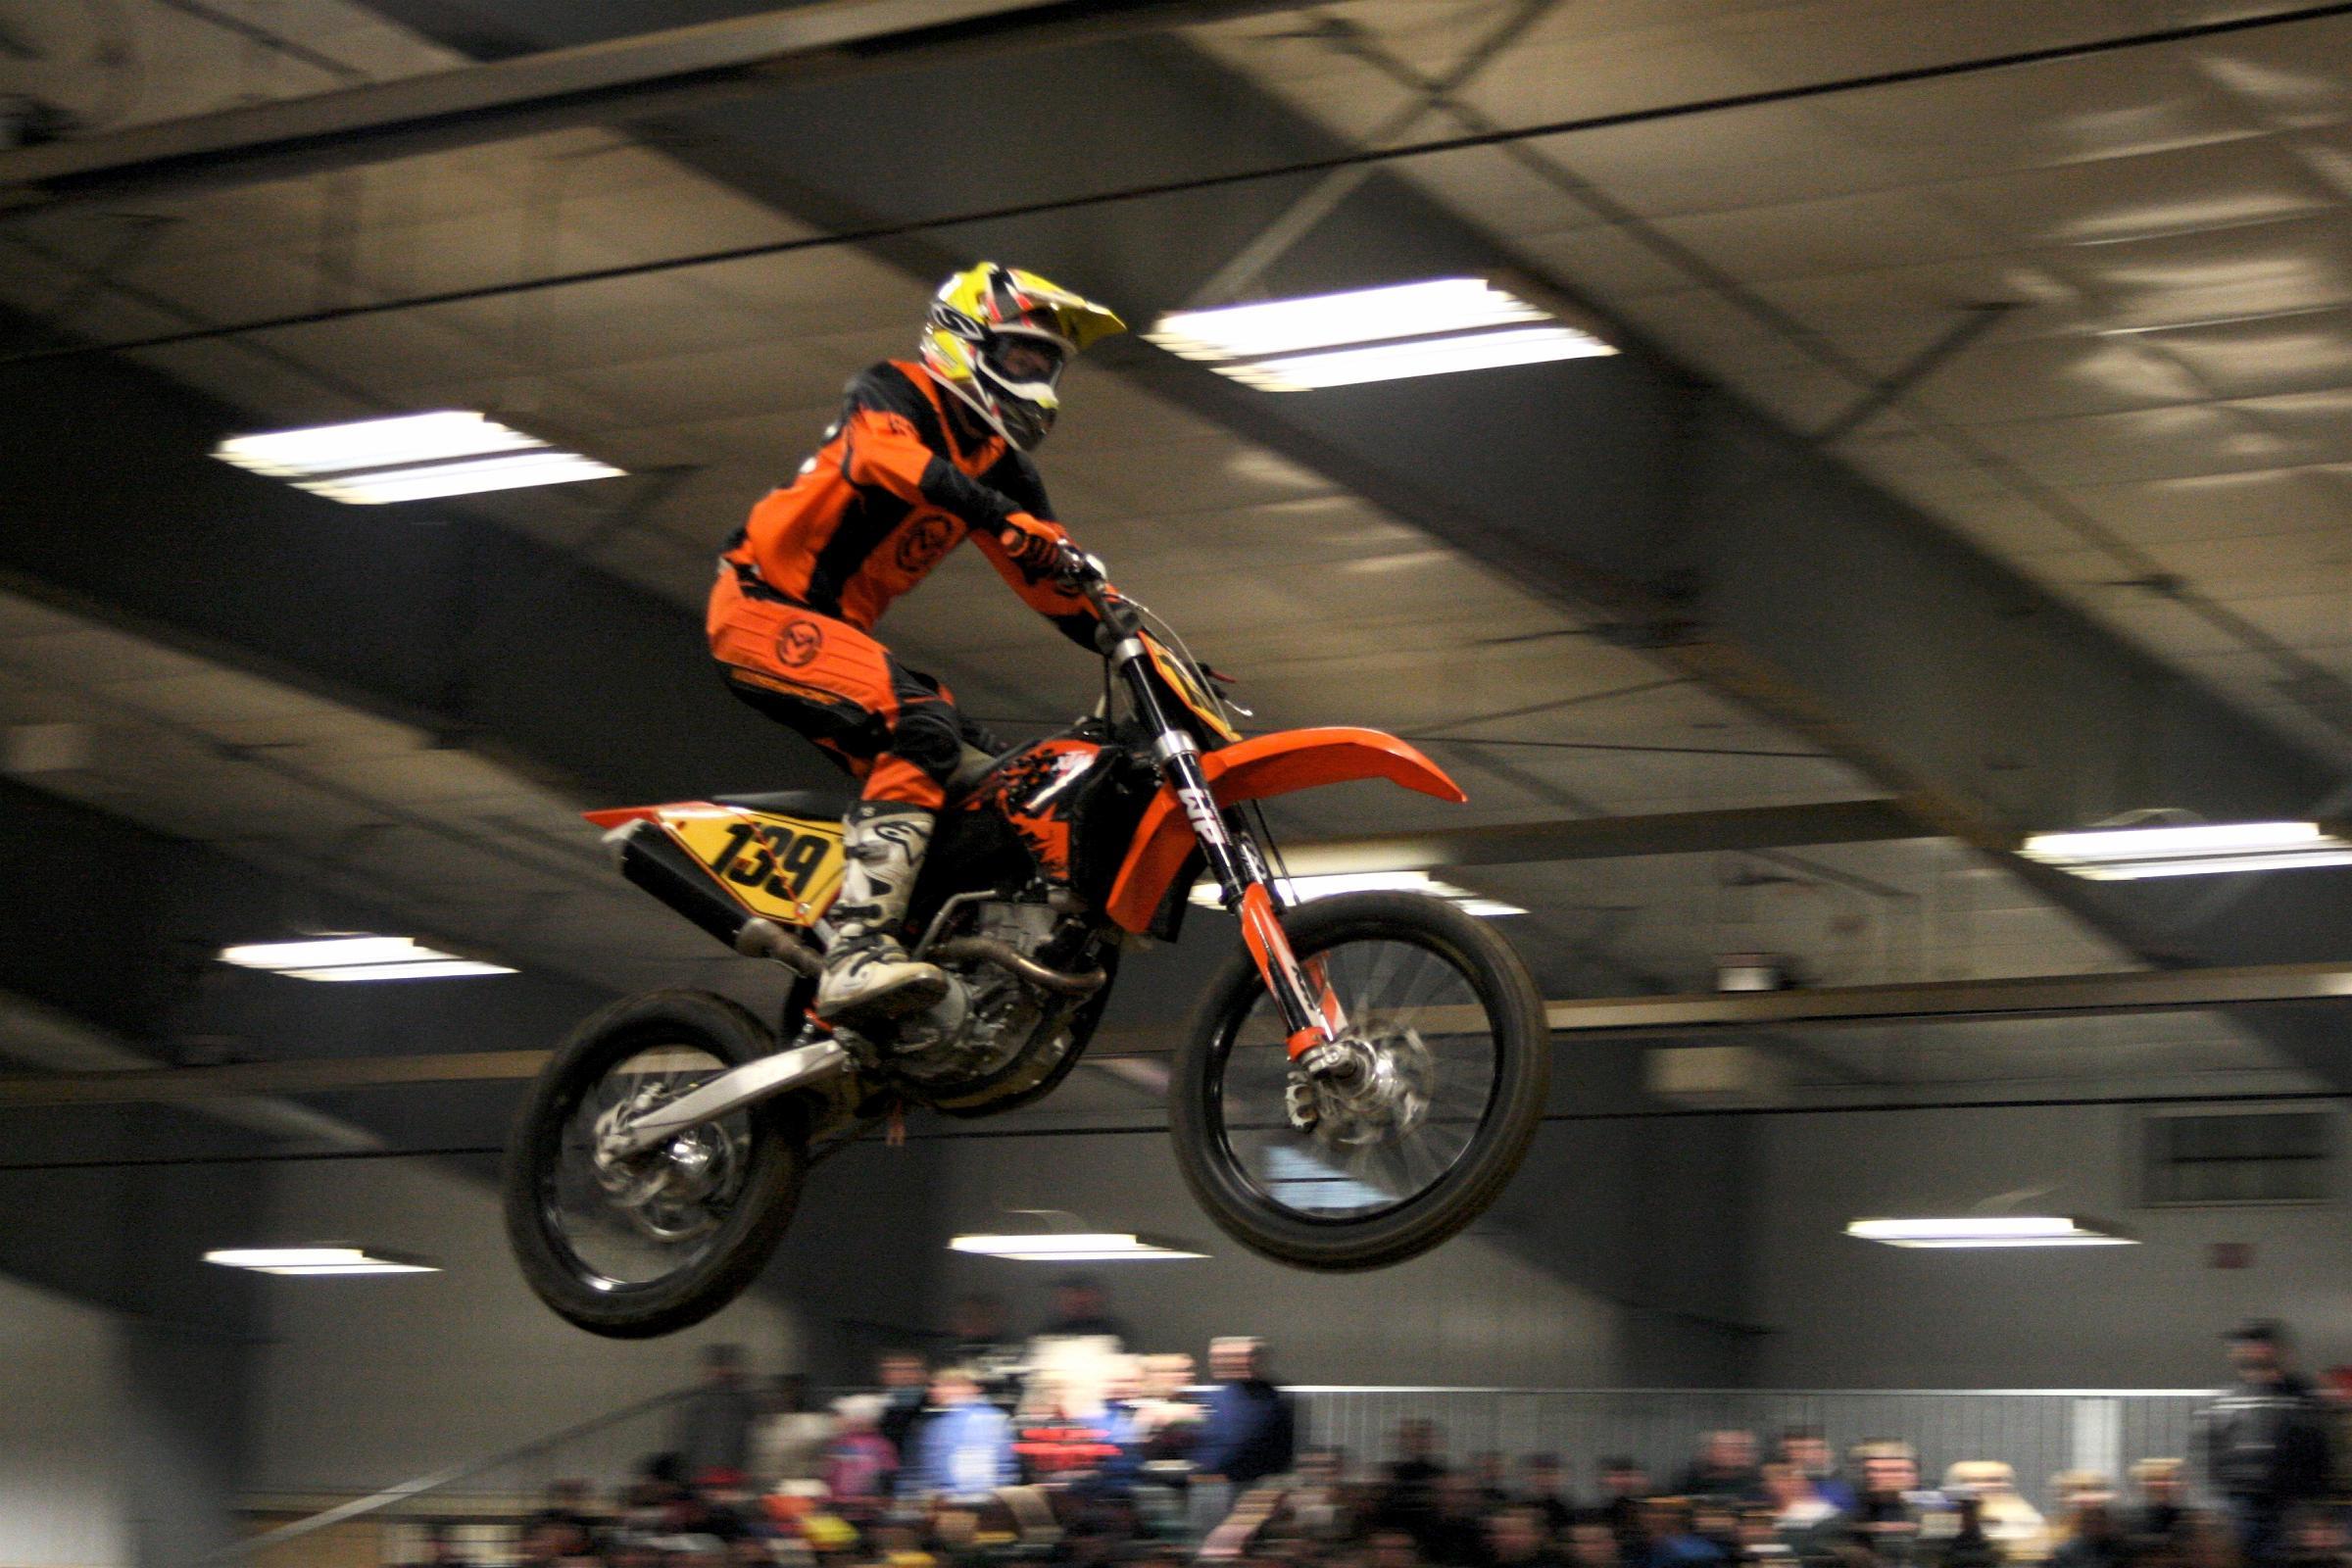 Motocross Wallpaper Images TheCelebrityPix 2400x1600